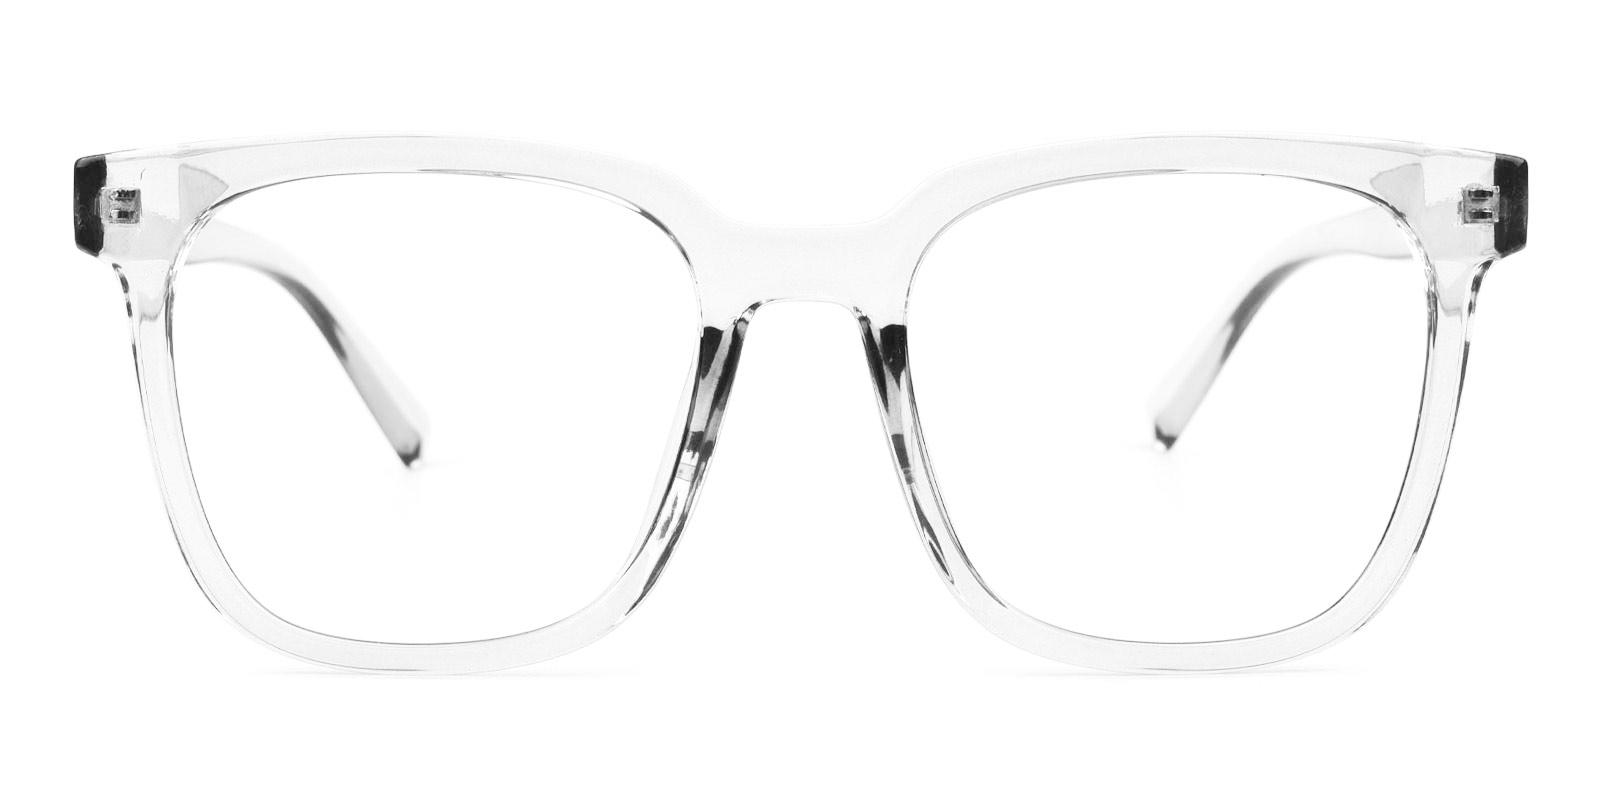 Phil-Translucent-Square-TR-Eyeglasses-detail